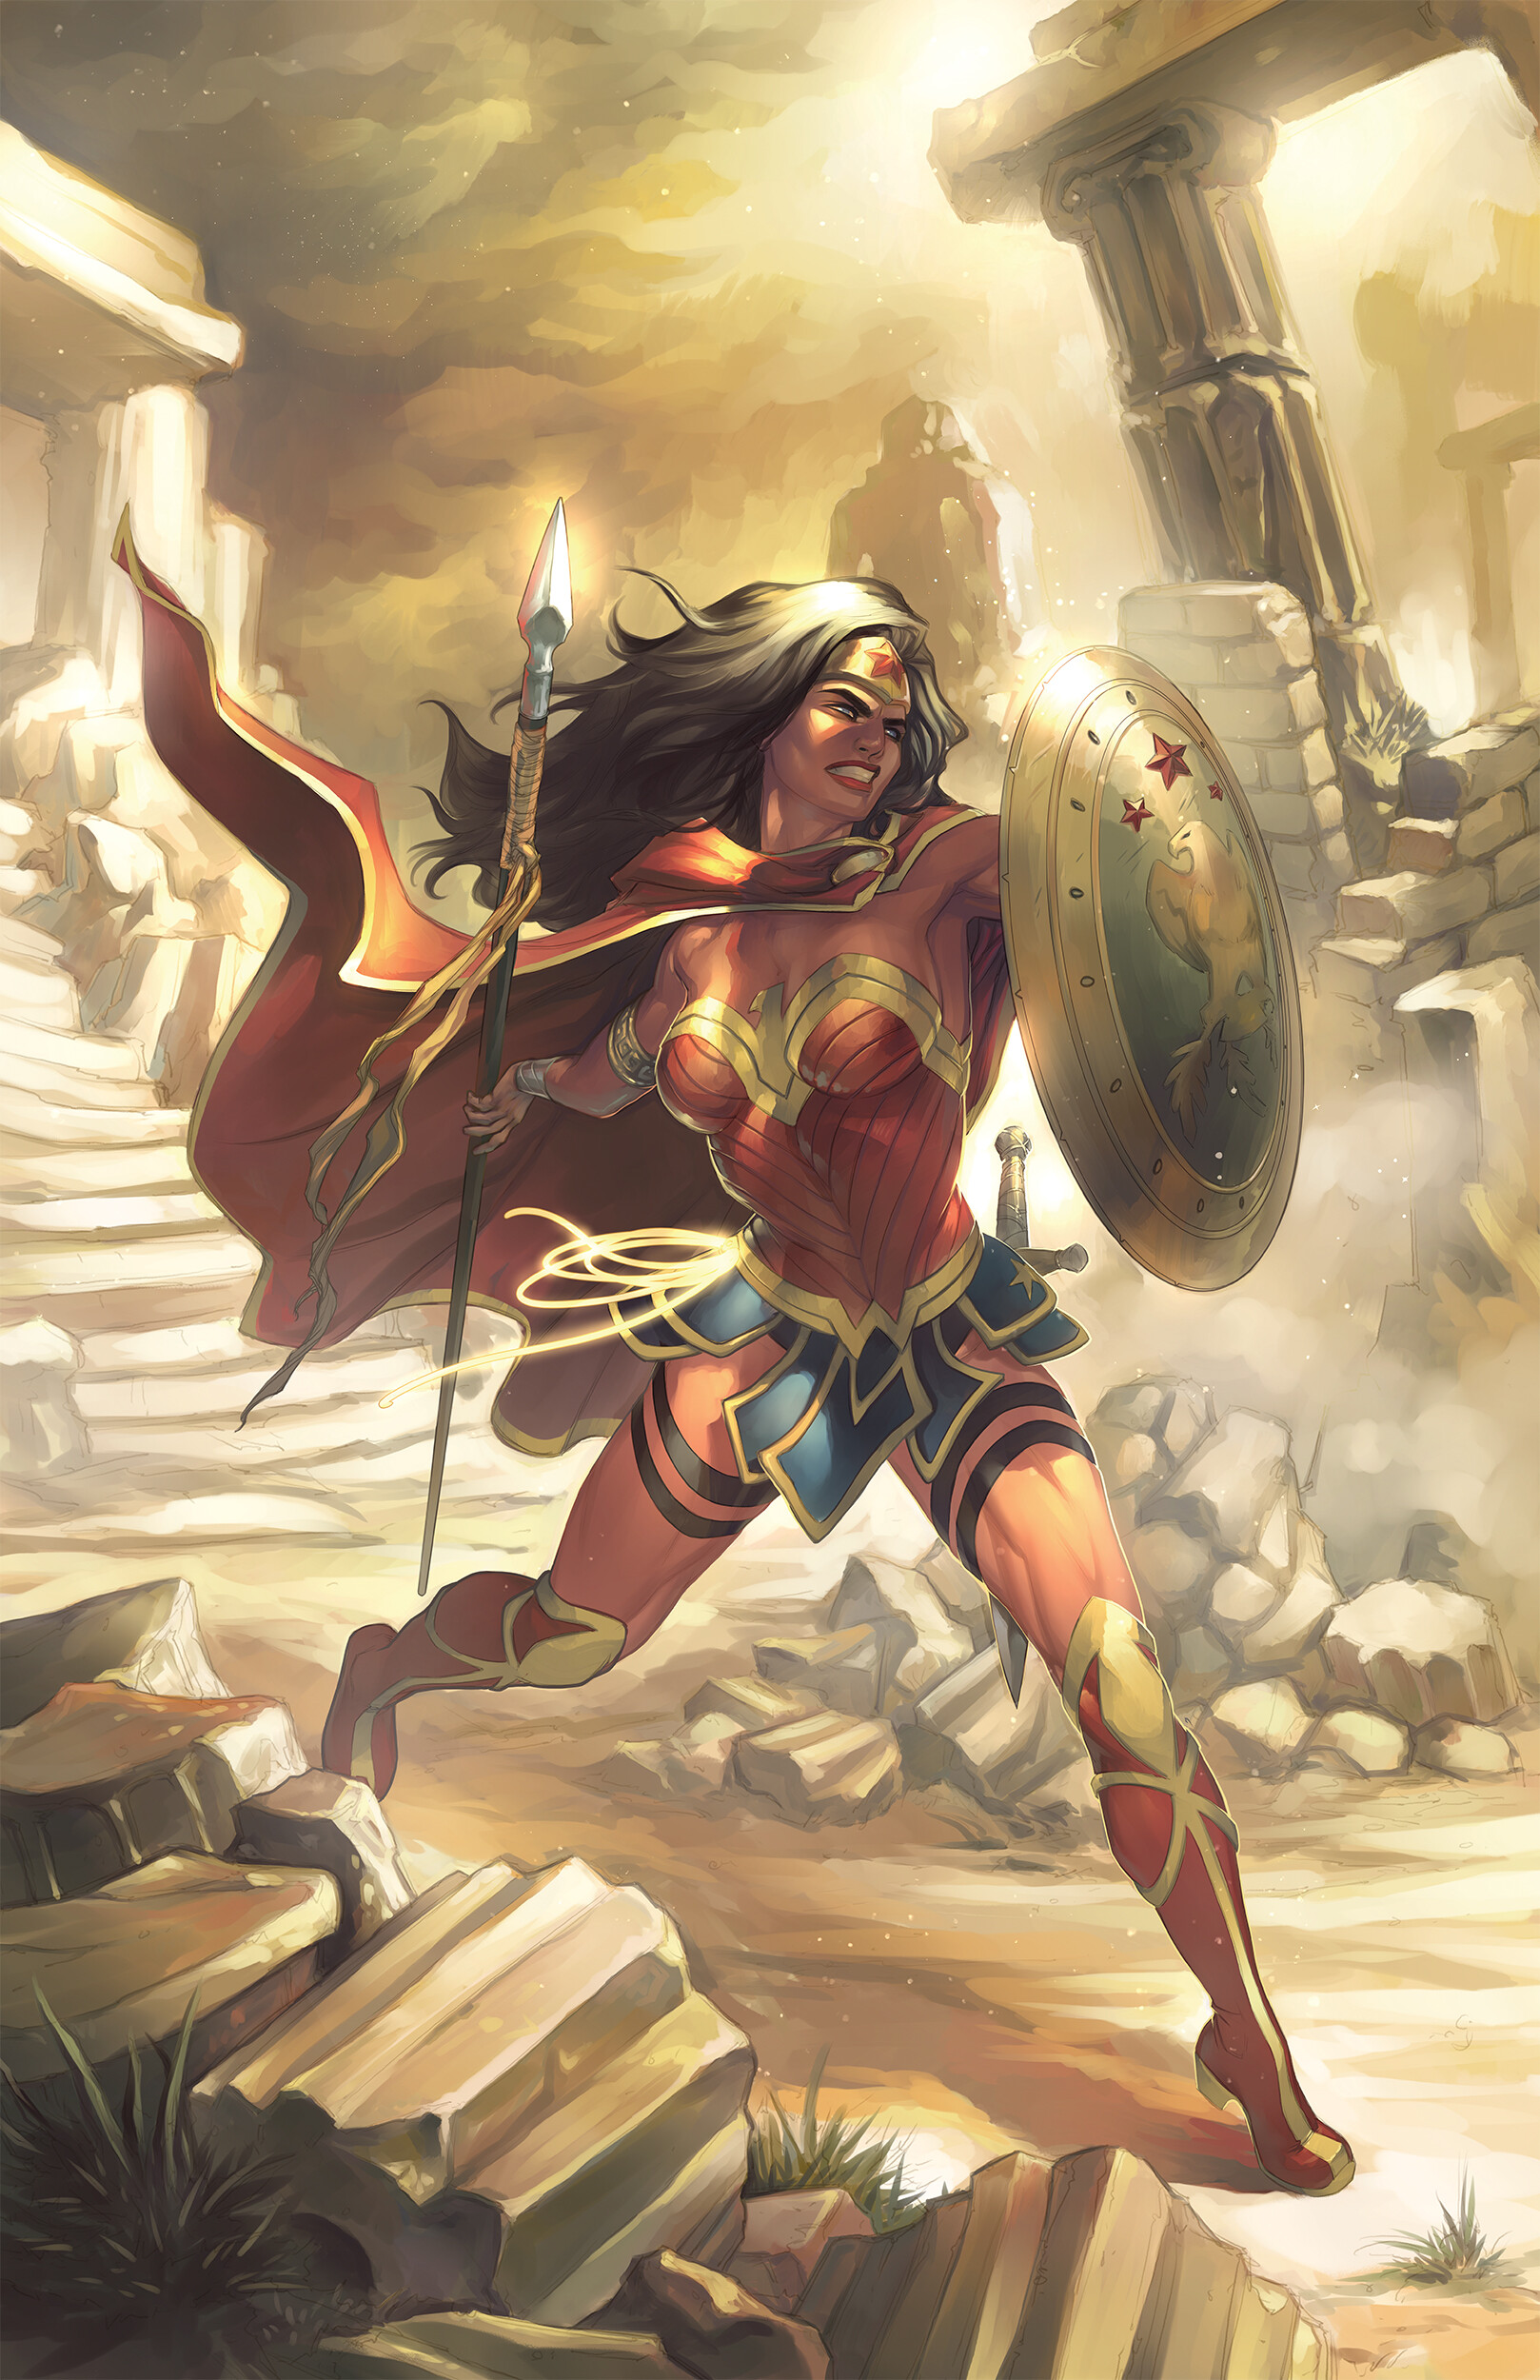 Meghan Hetrick Artwork ArtStation Women Fantasy Art Warrior Fantasy Girl Wonder Woman Spear Shield C 1618x2500